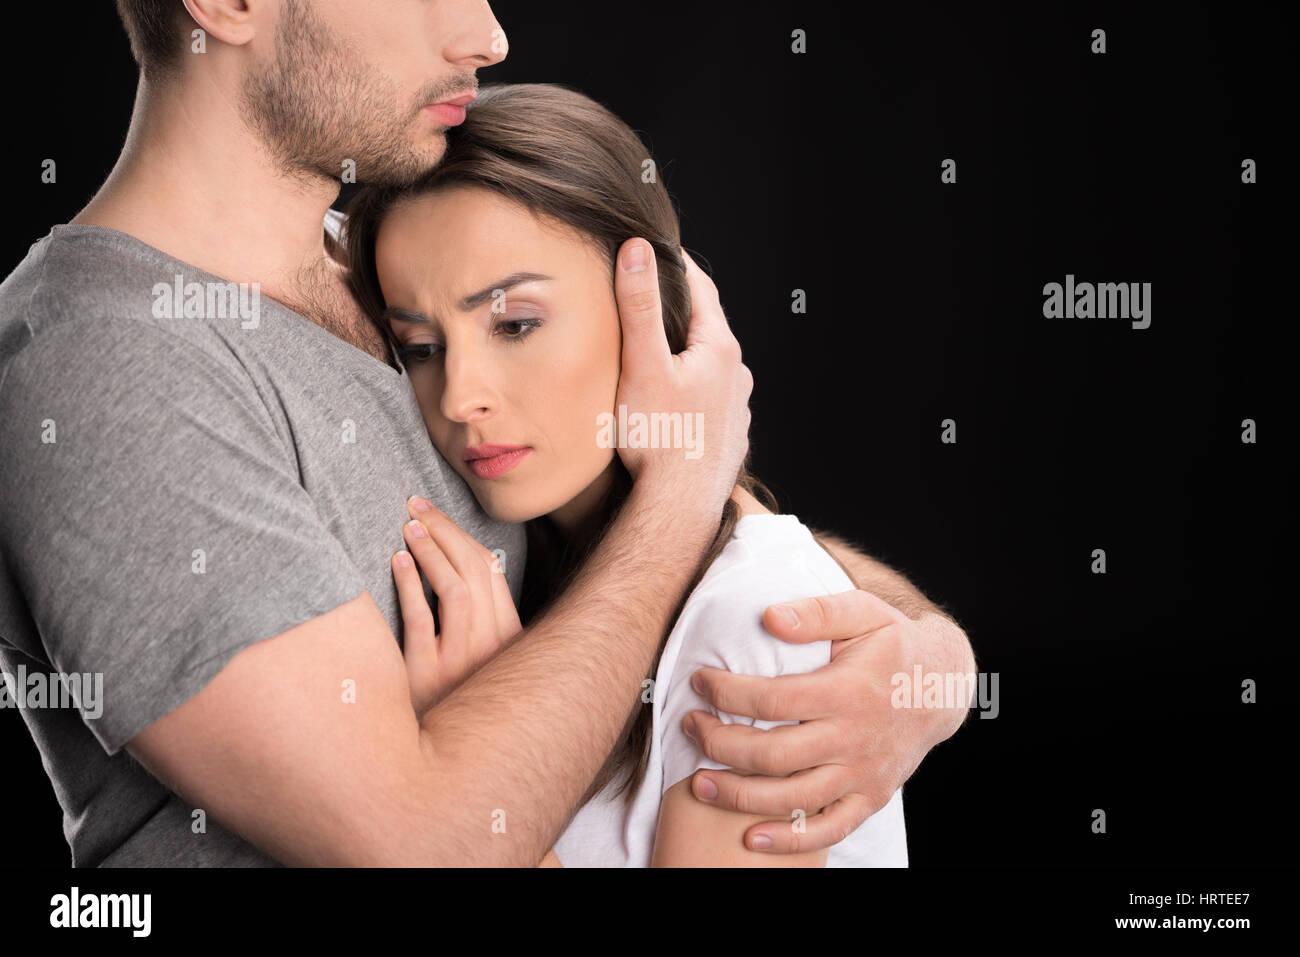 Man hugging woman  Decoding a Man's Hug  2019-07-09